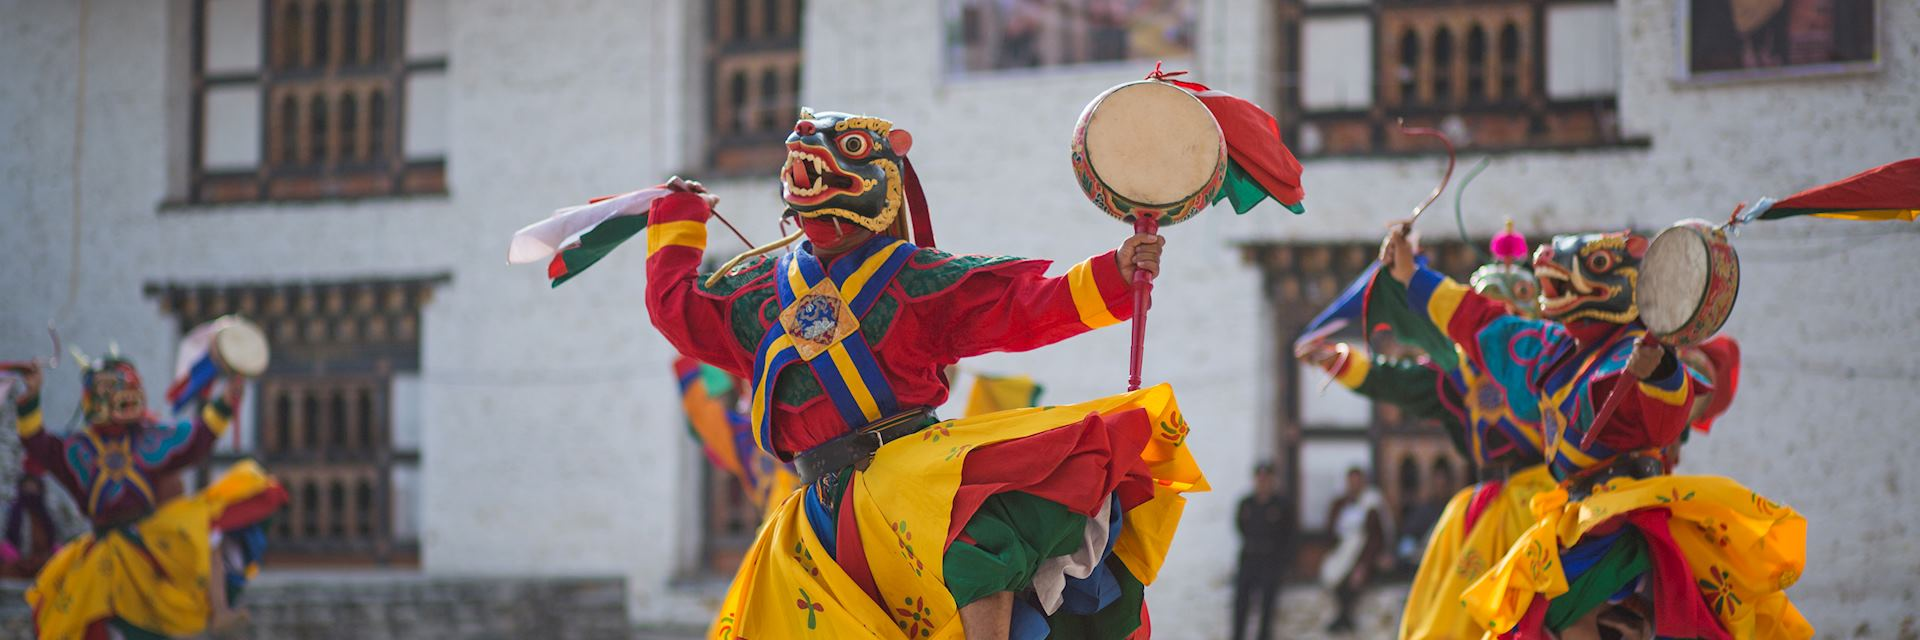 Traditional dance in Bhutan